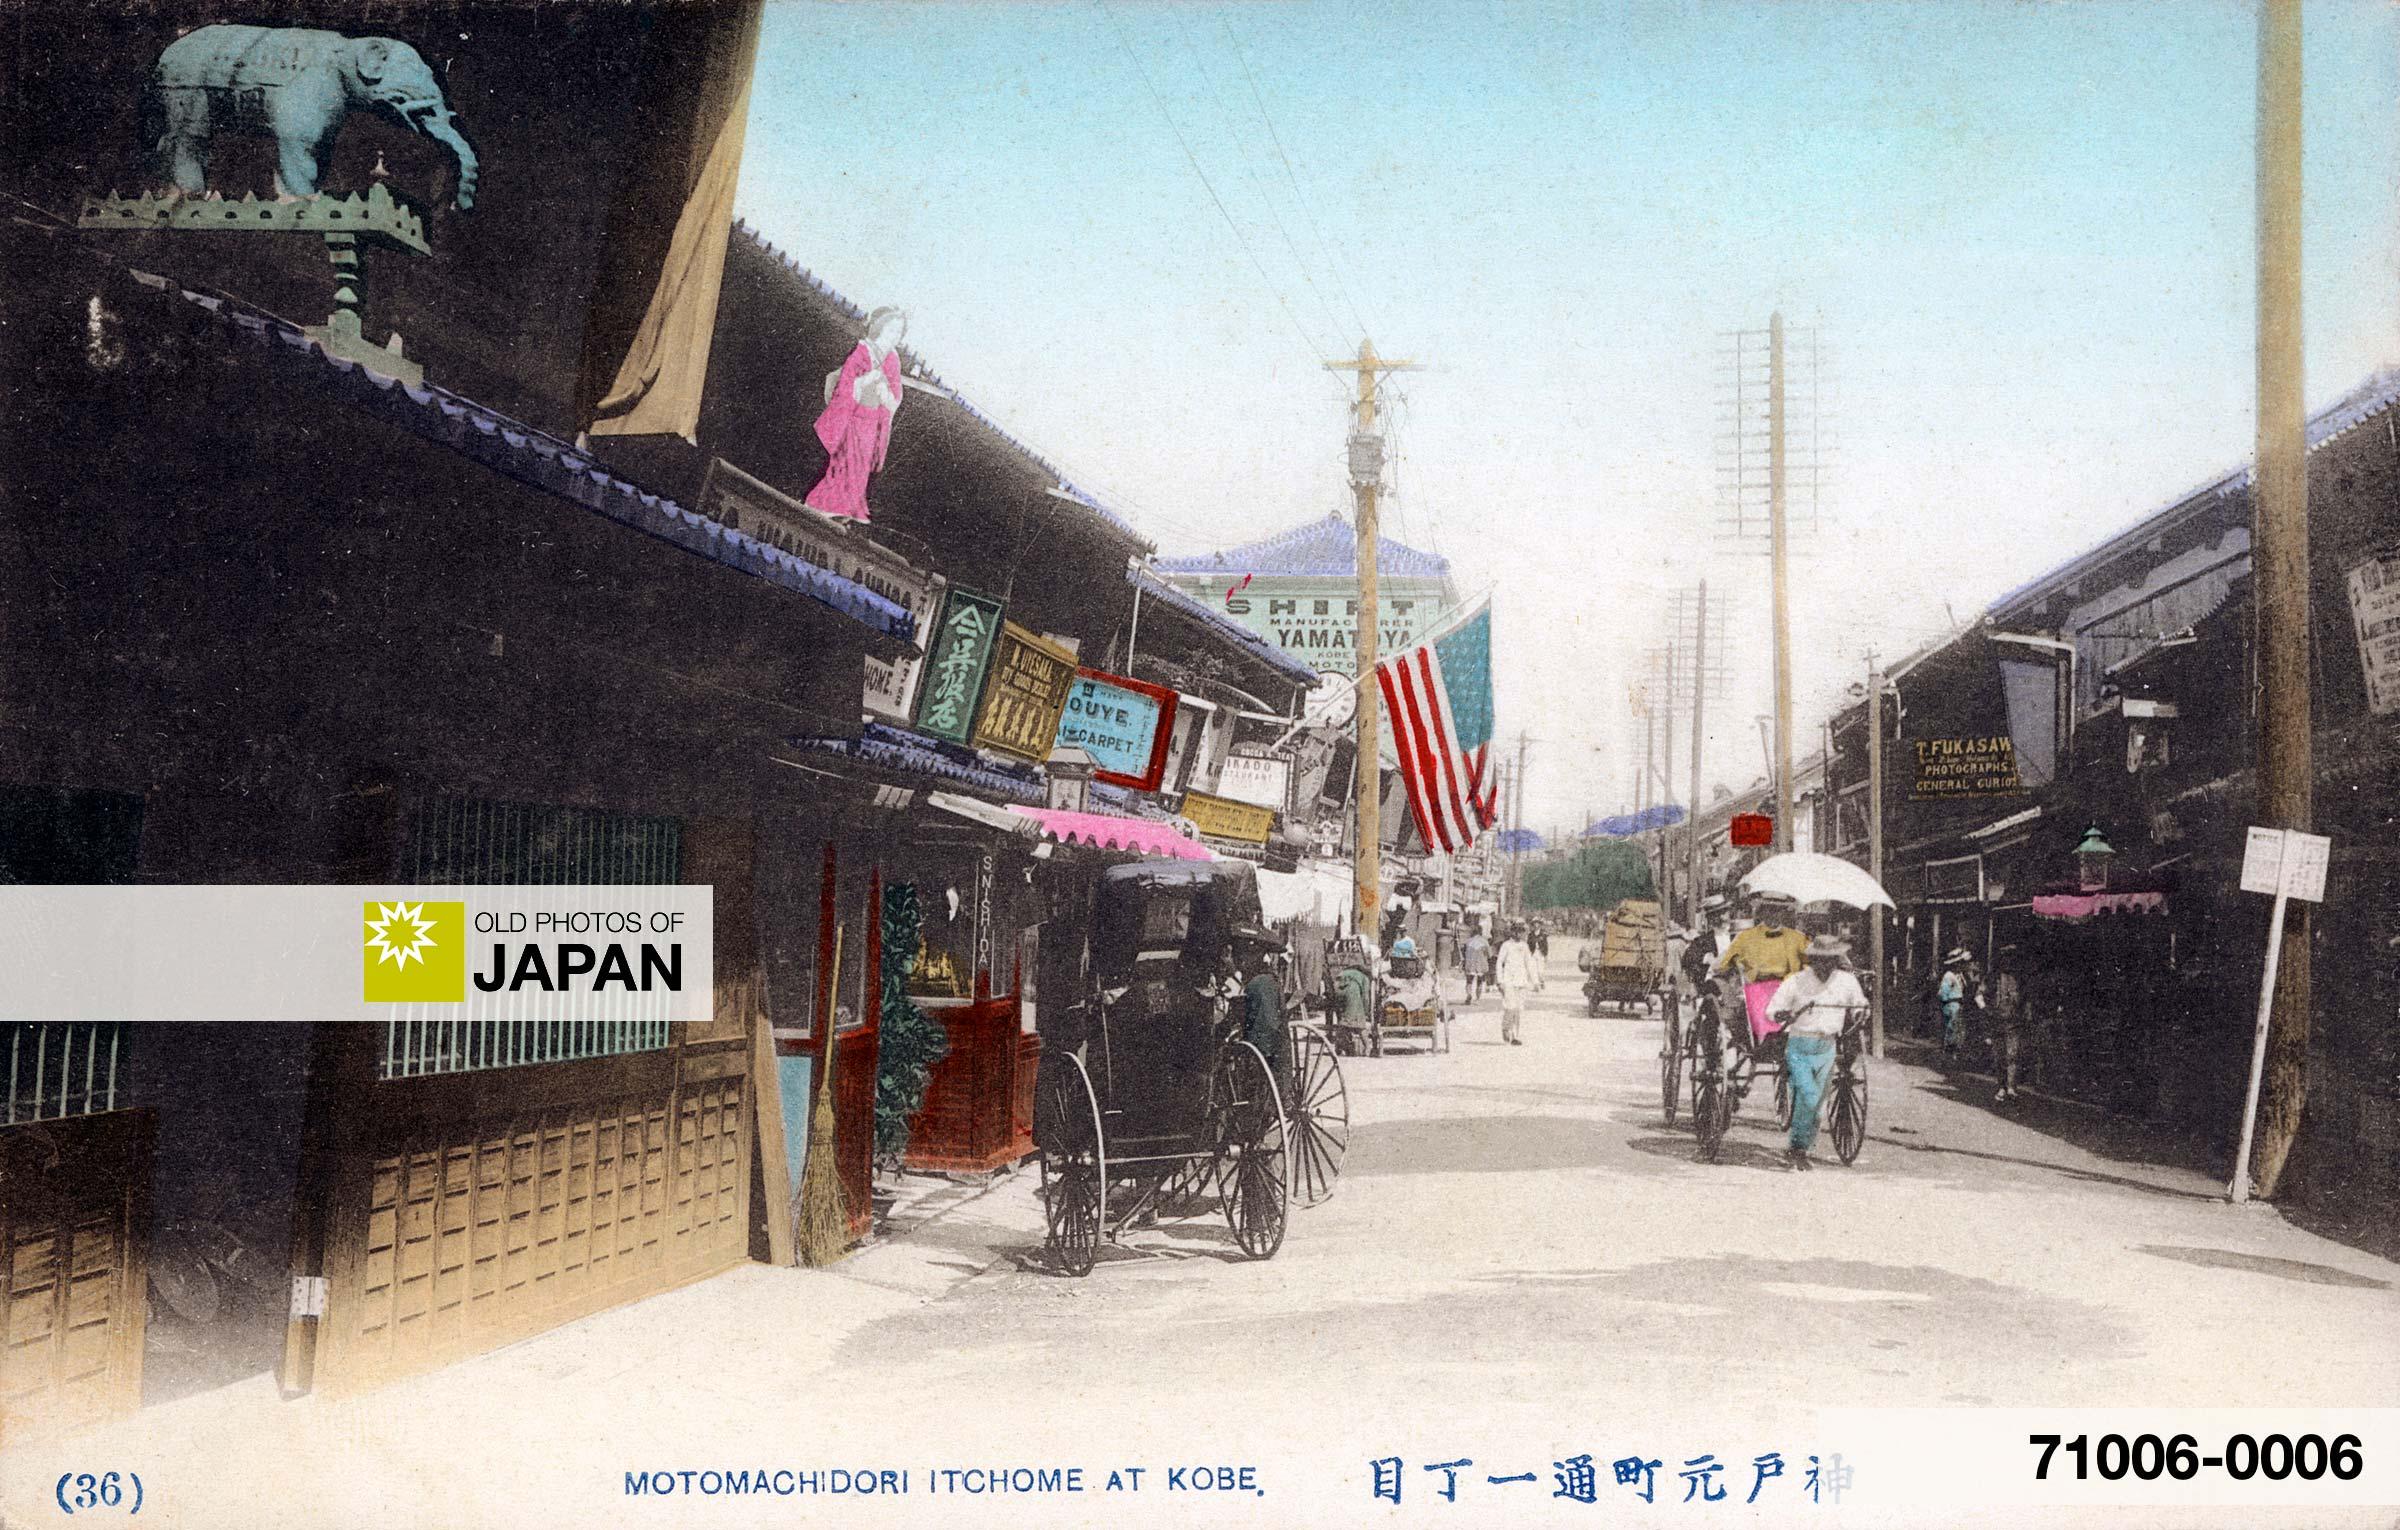 Motomachi Itchome, Kobe